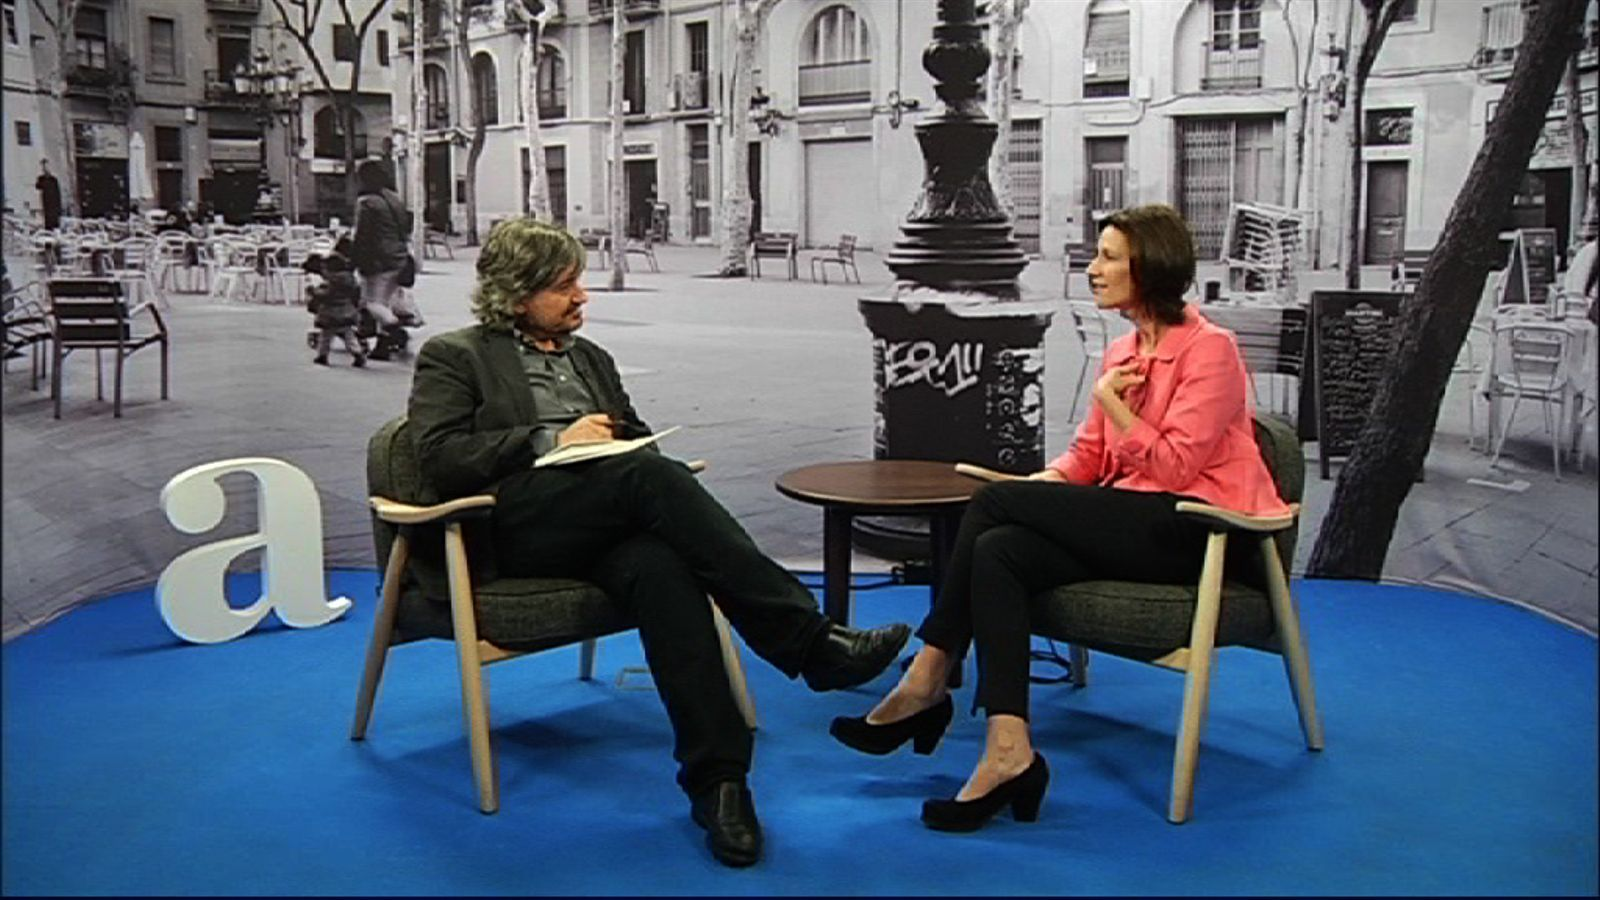 Entrevista de Carles Capdevila a Catherine L'Ecuyer